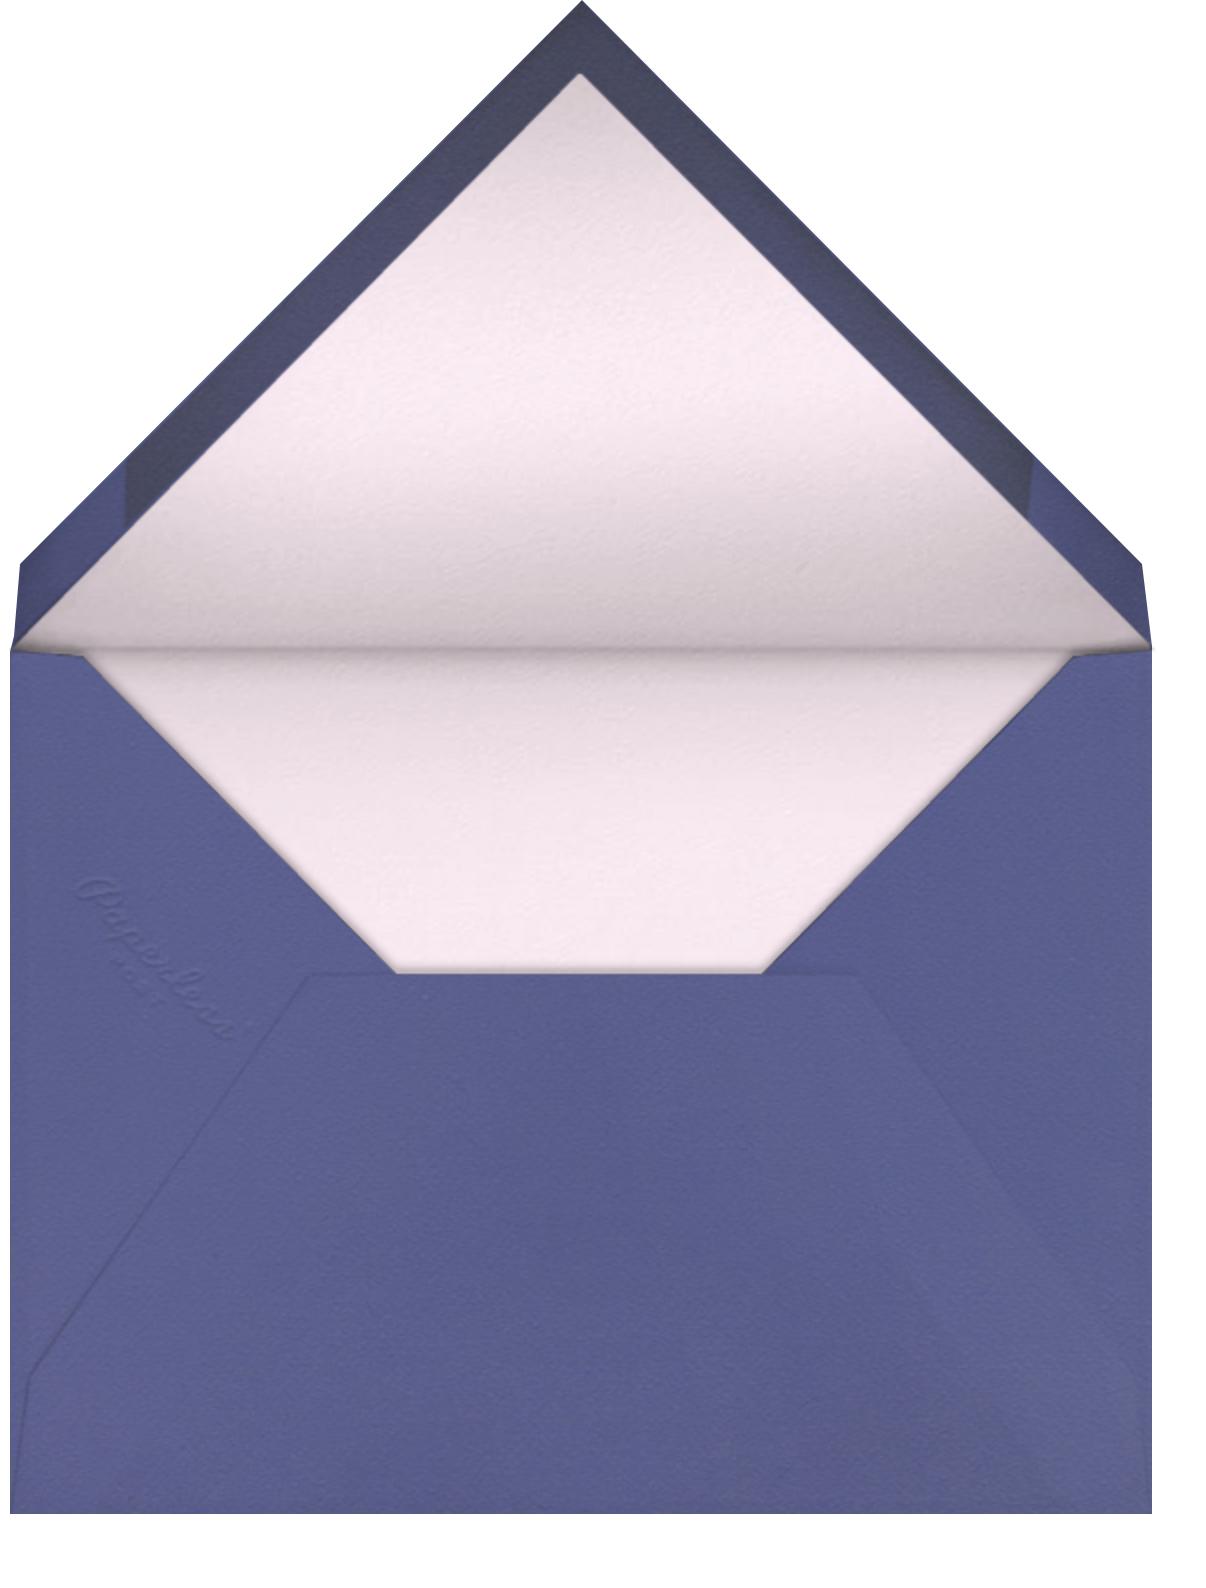 Ikat Arrow - Lilac - Paperless Post - Envelope